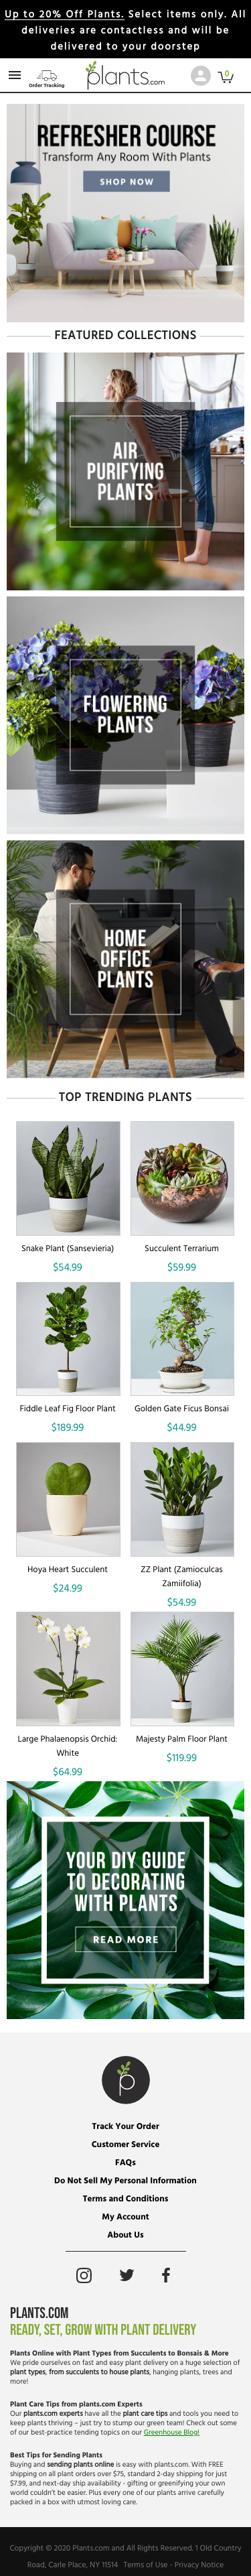 plants.com Coupon